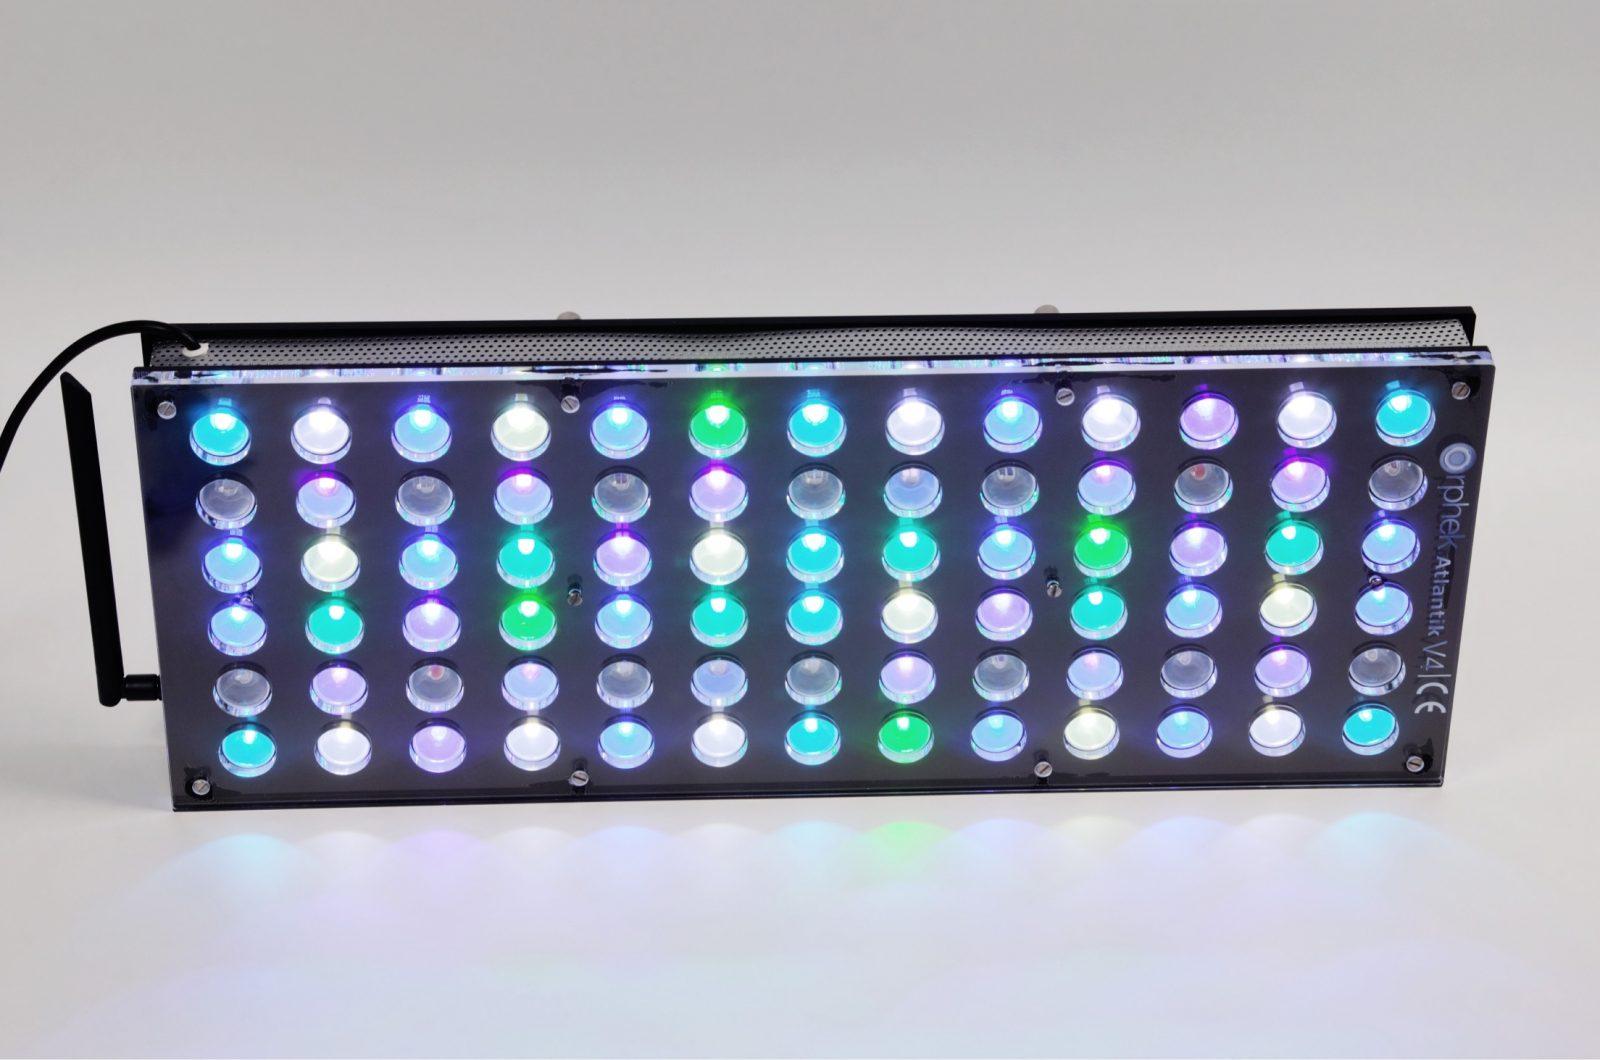 orphek atlantik v4 bedste rev akvarium LED lys 2020